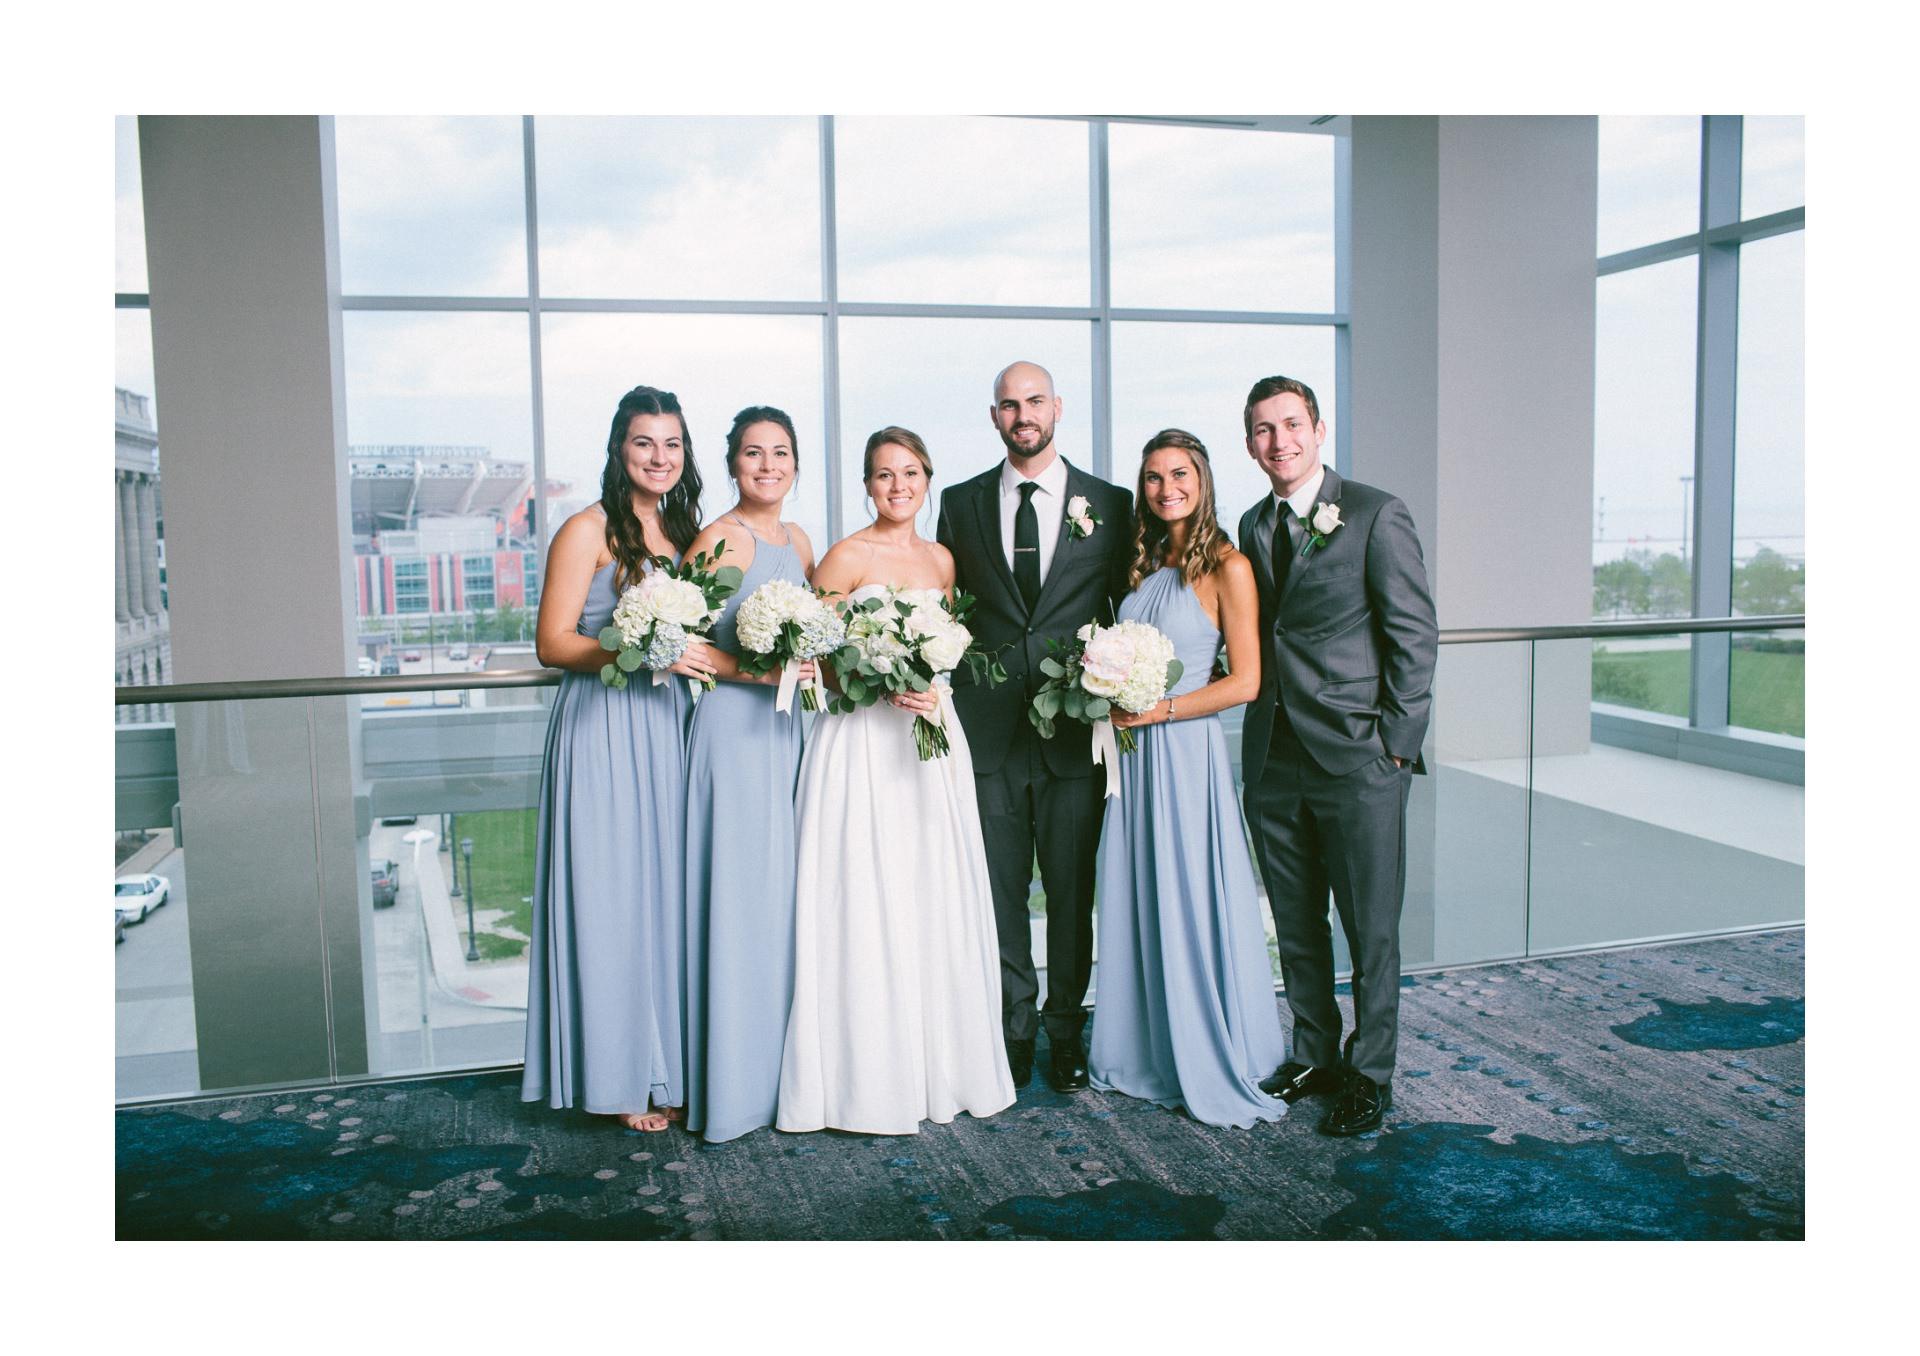 Dowtown Hilton Cleveland Wedding Photographer 2 2.jpg